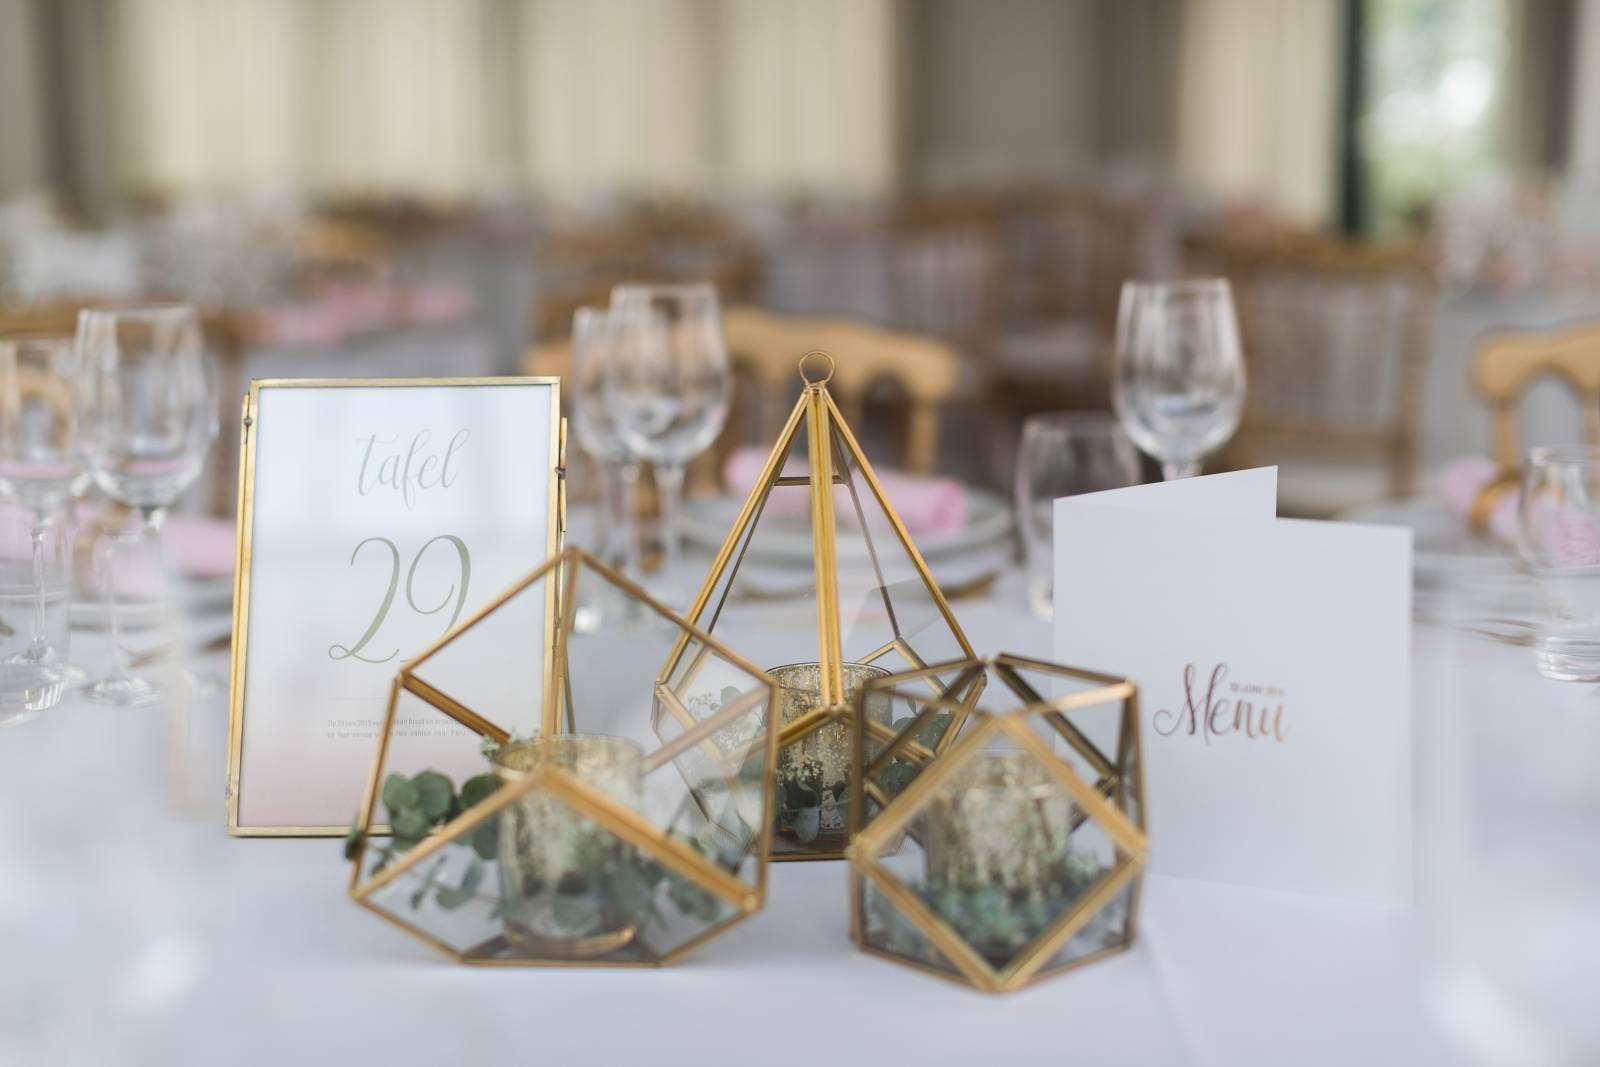 Atelier Rosé - Wedding Planner - House of Weddings Lise & Thomas - Hung Tran Photography (1)